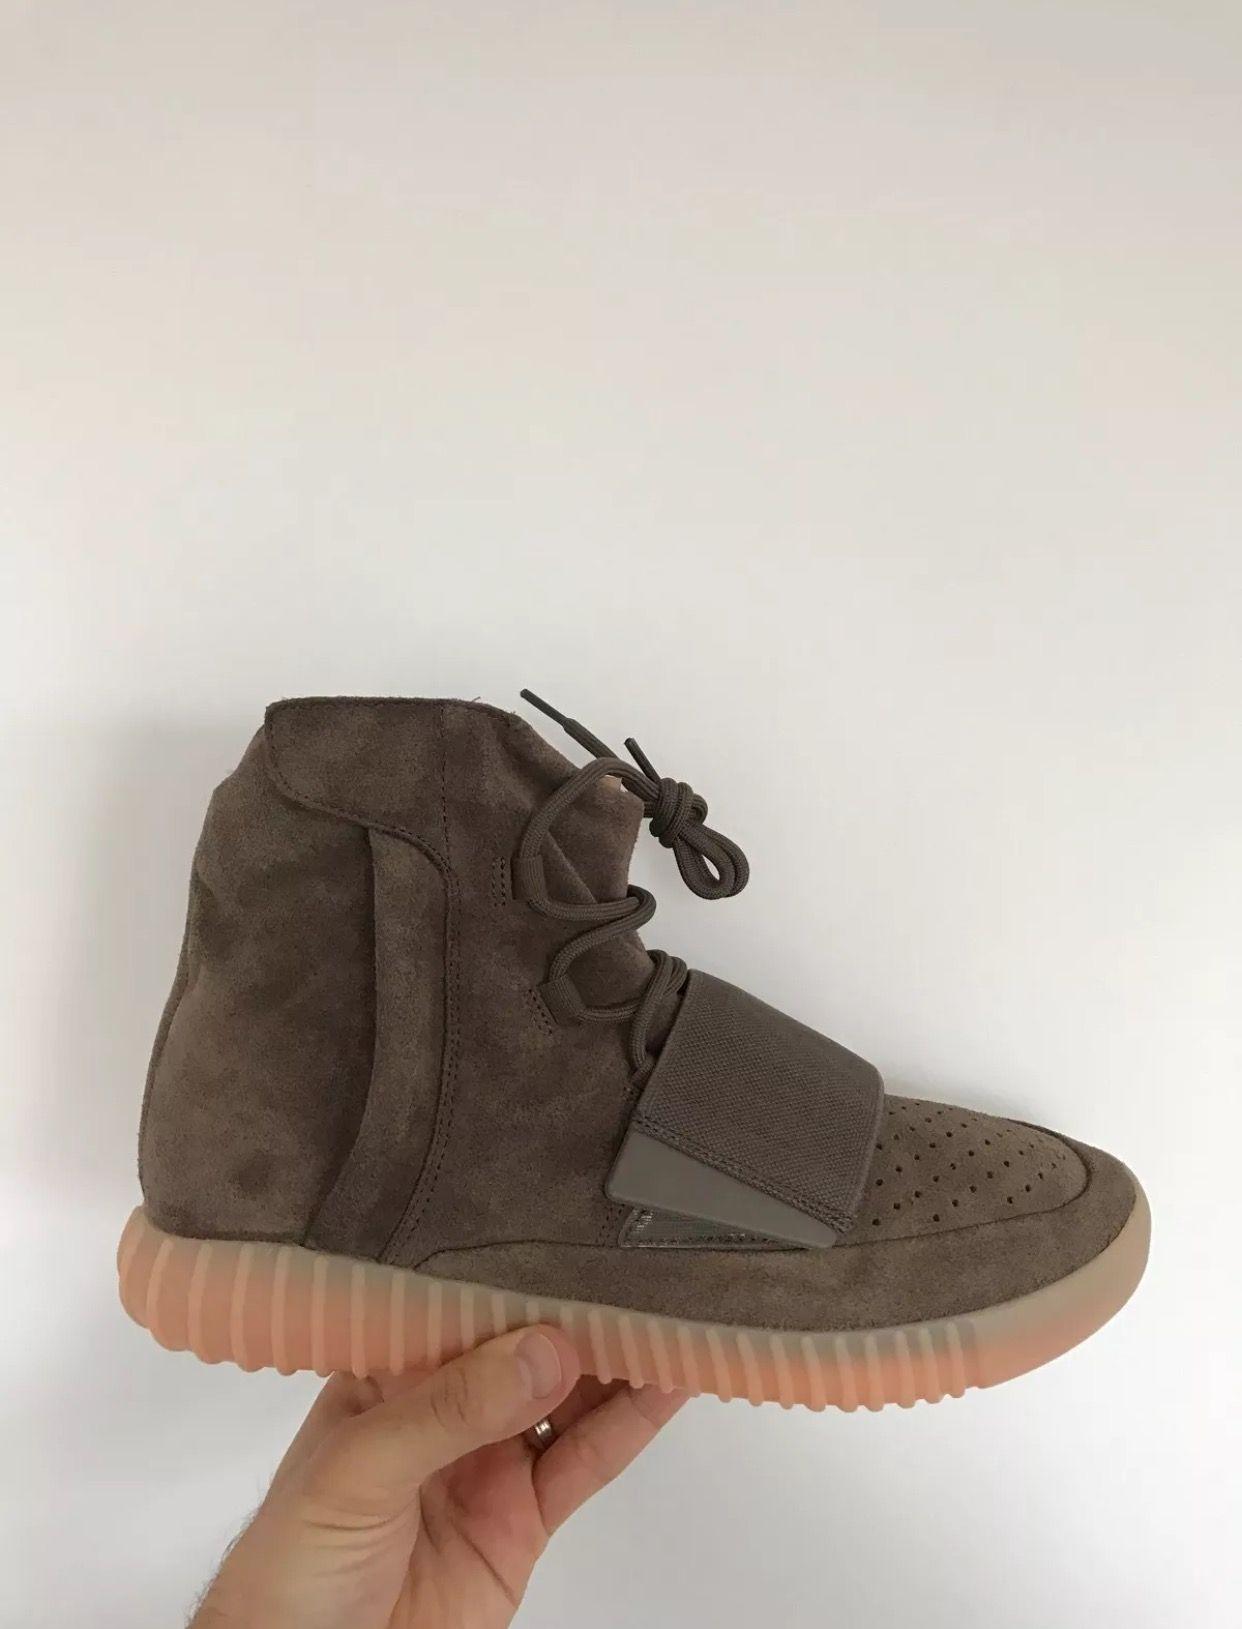 michael jordan shoes company yeezy 750 chocolate legit 767606